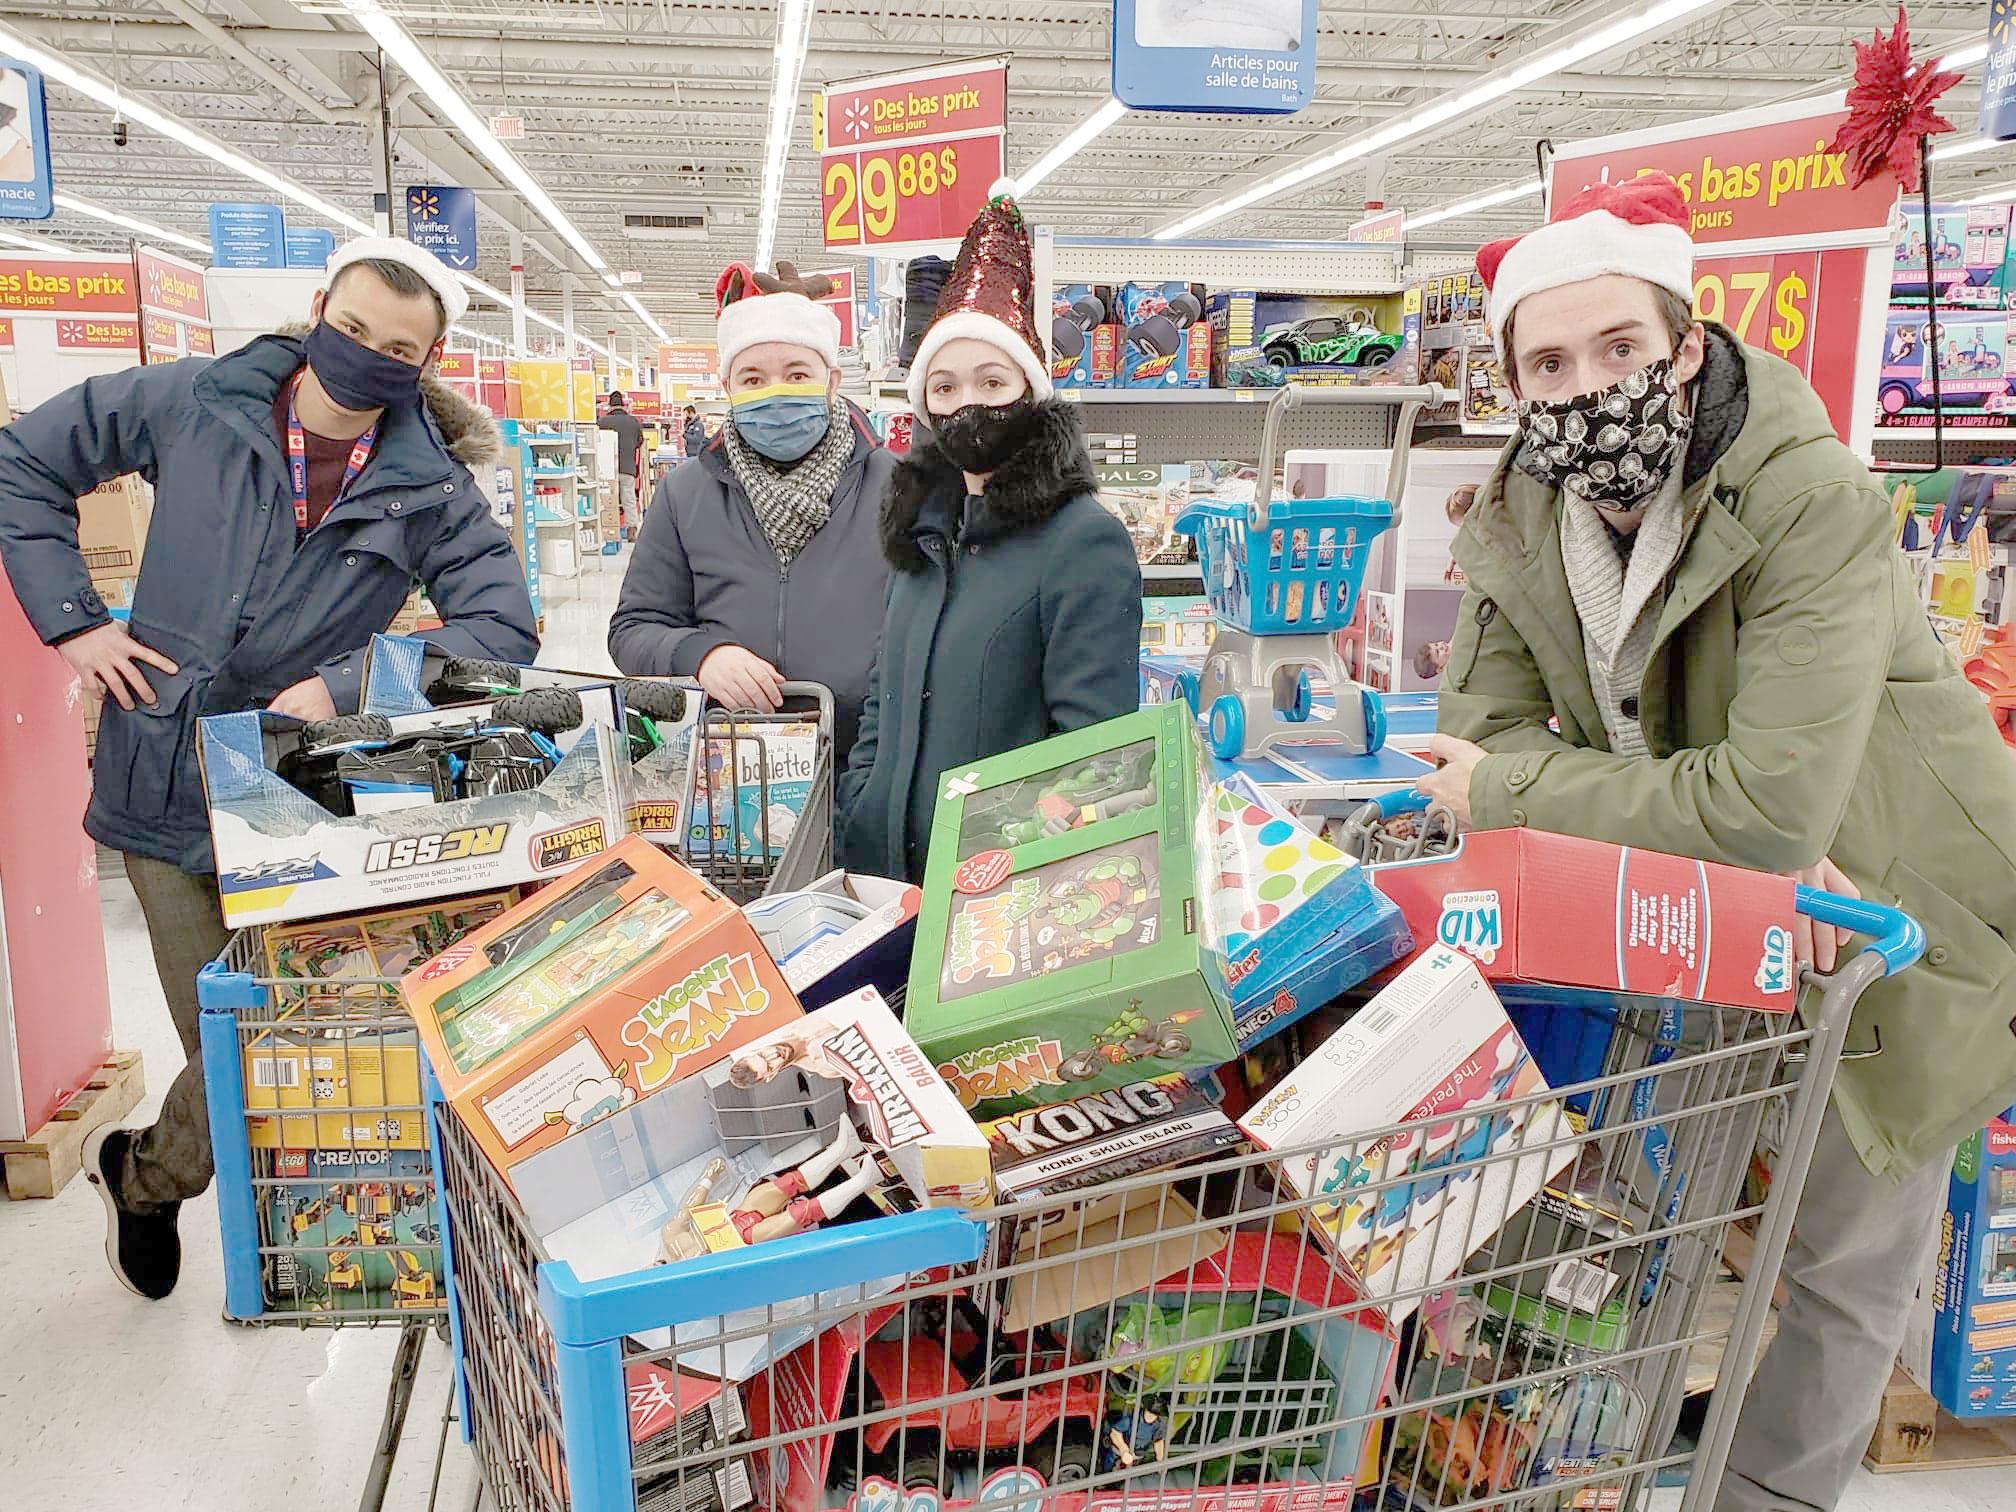 Charity team activities